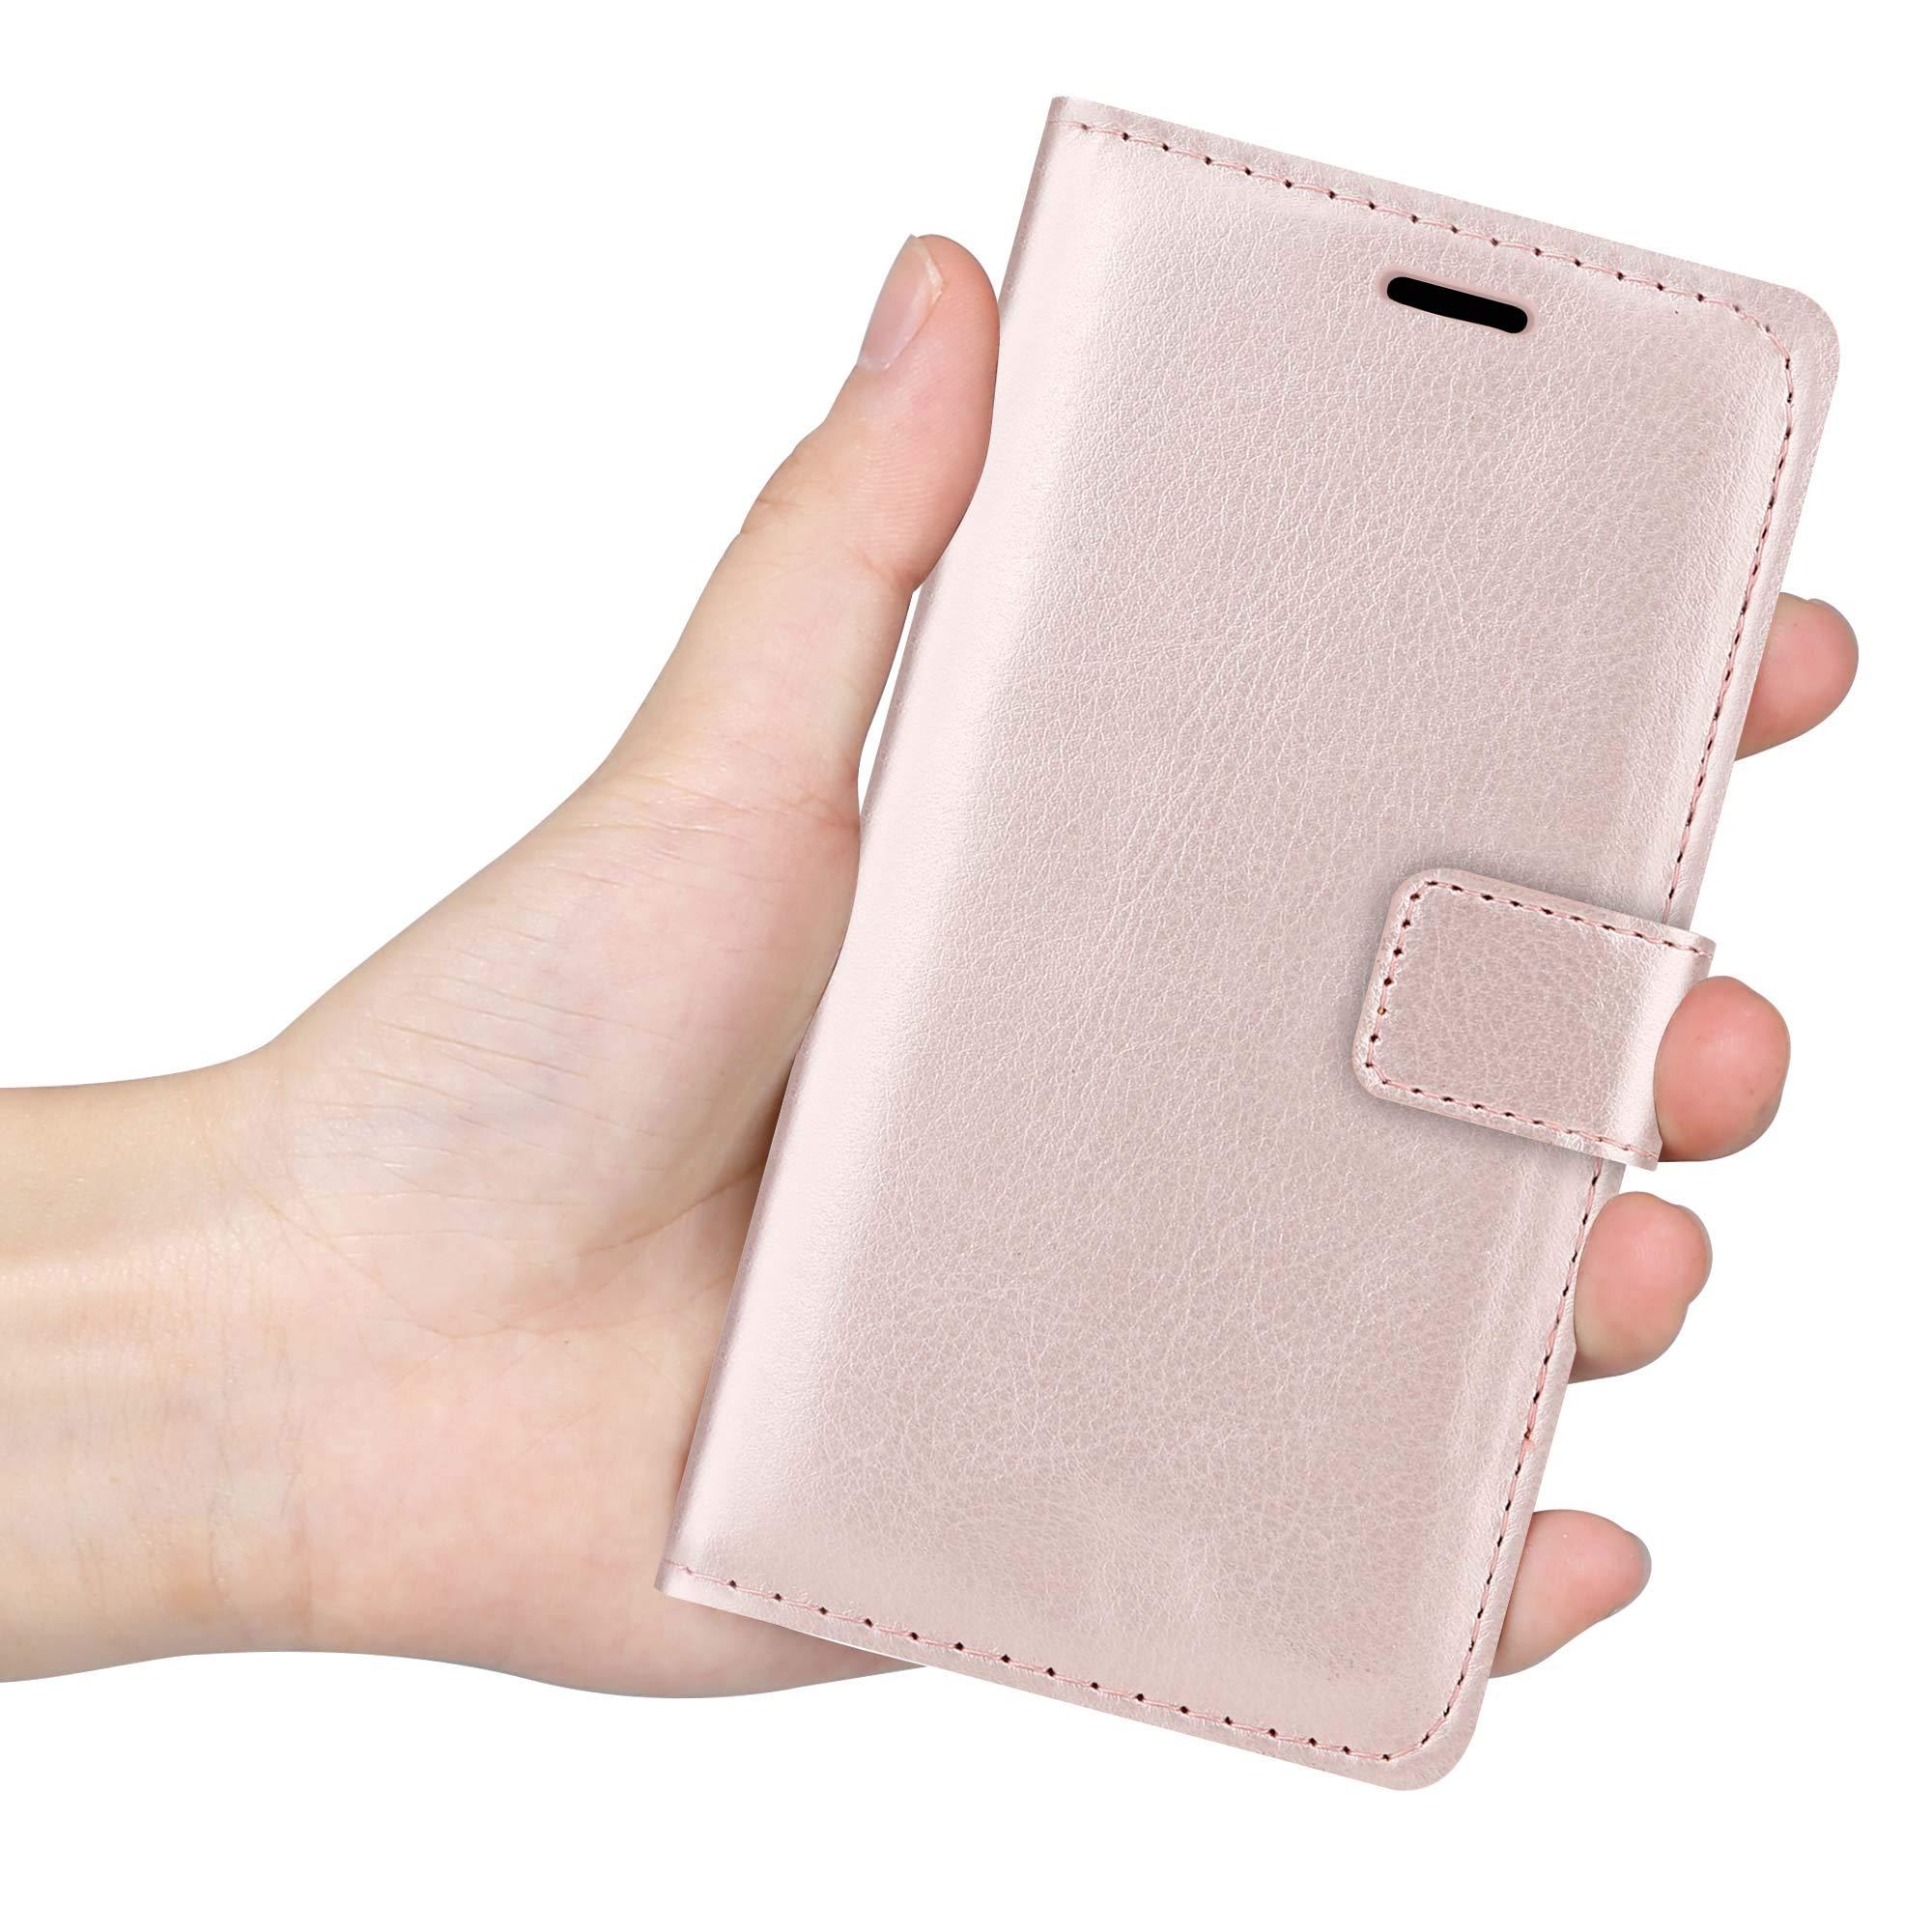 PIXFAB Vodafone Smart V10 VFD 730 (5.9